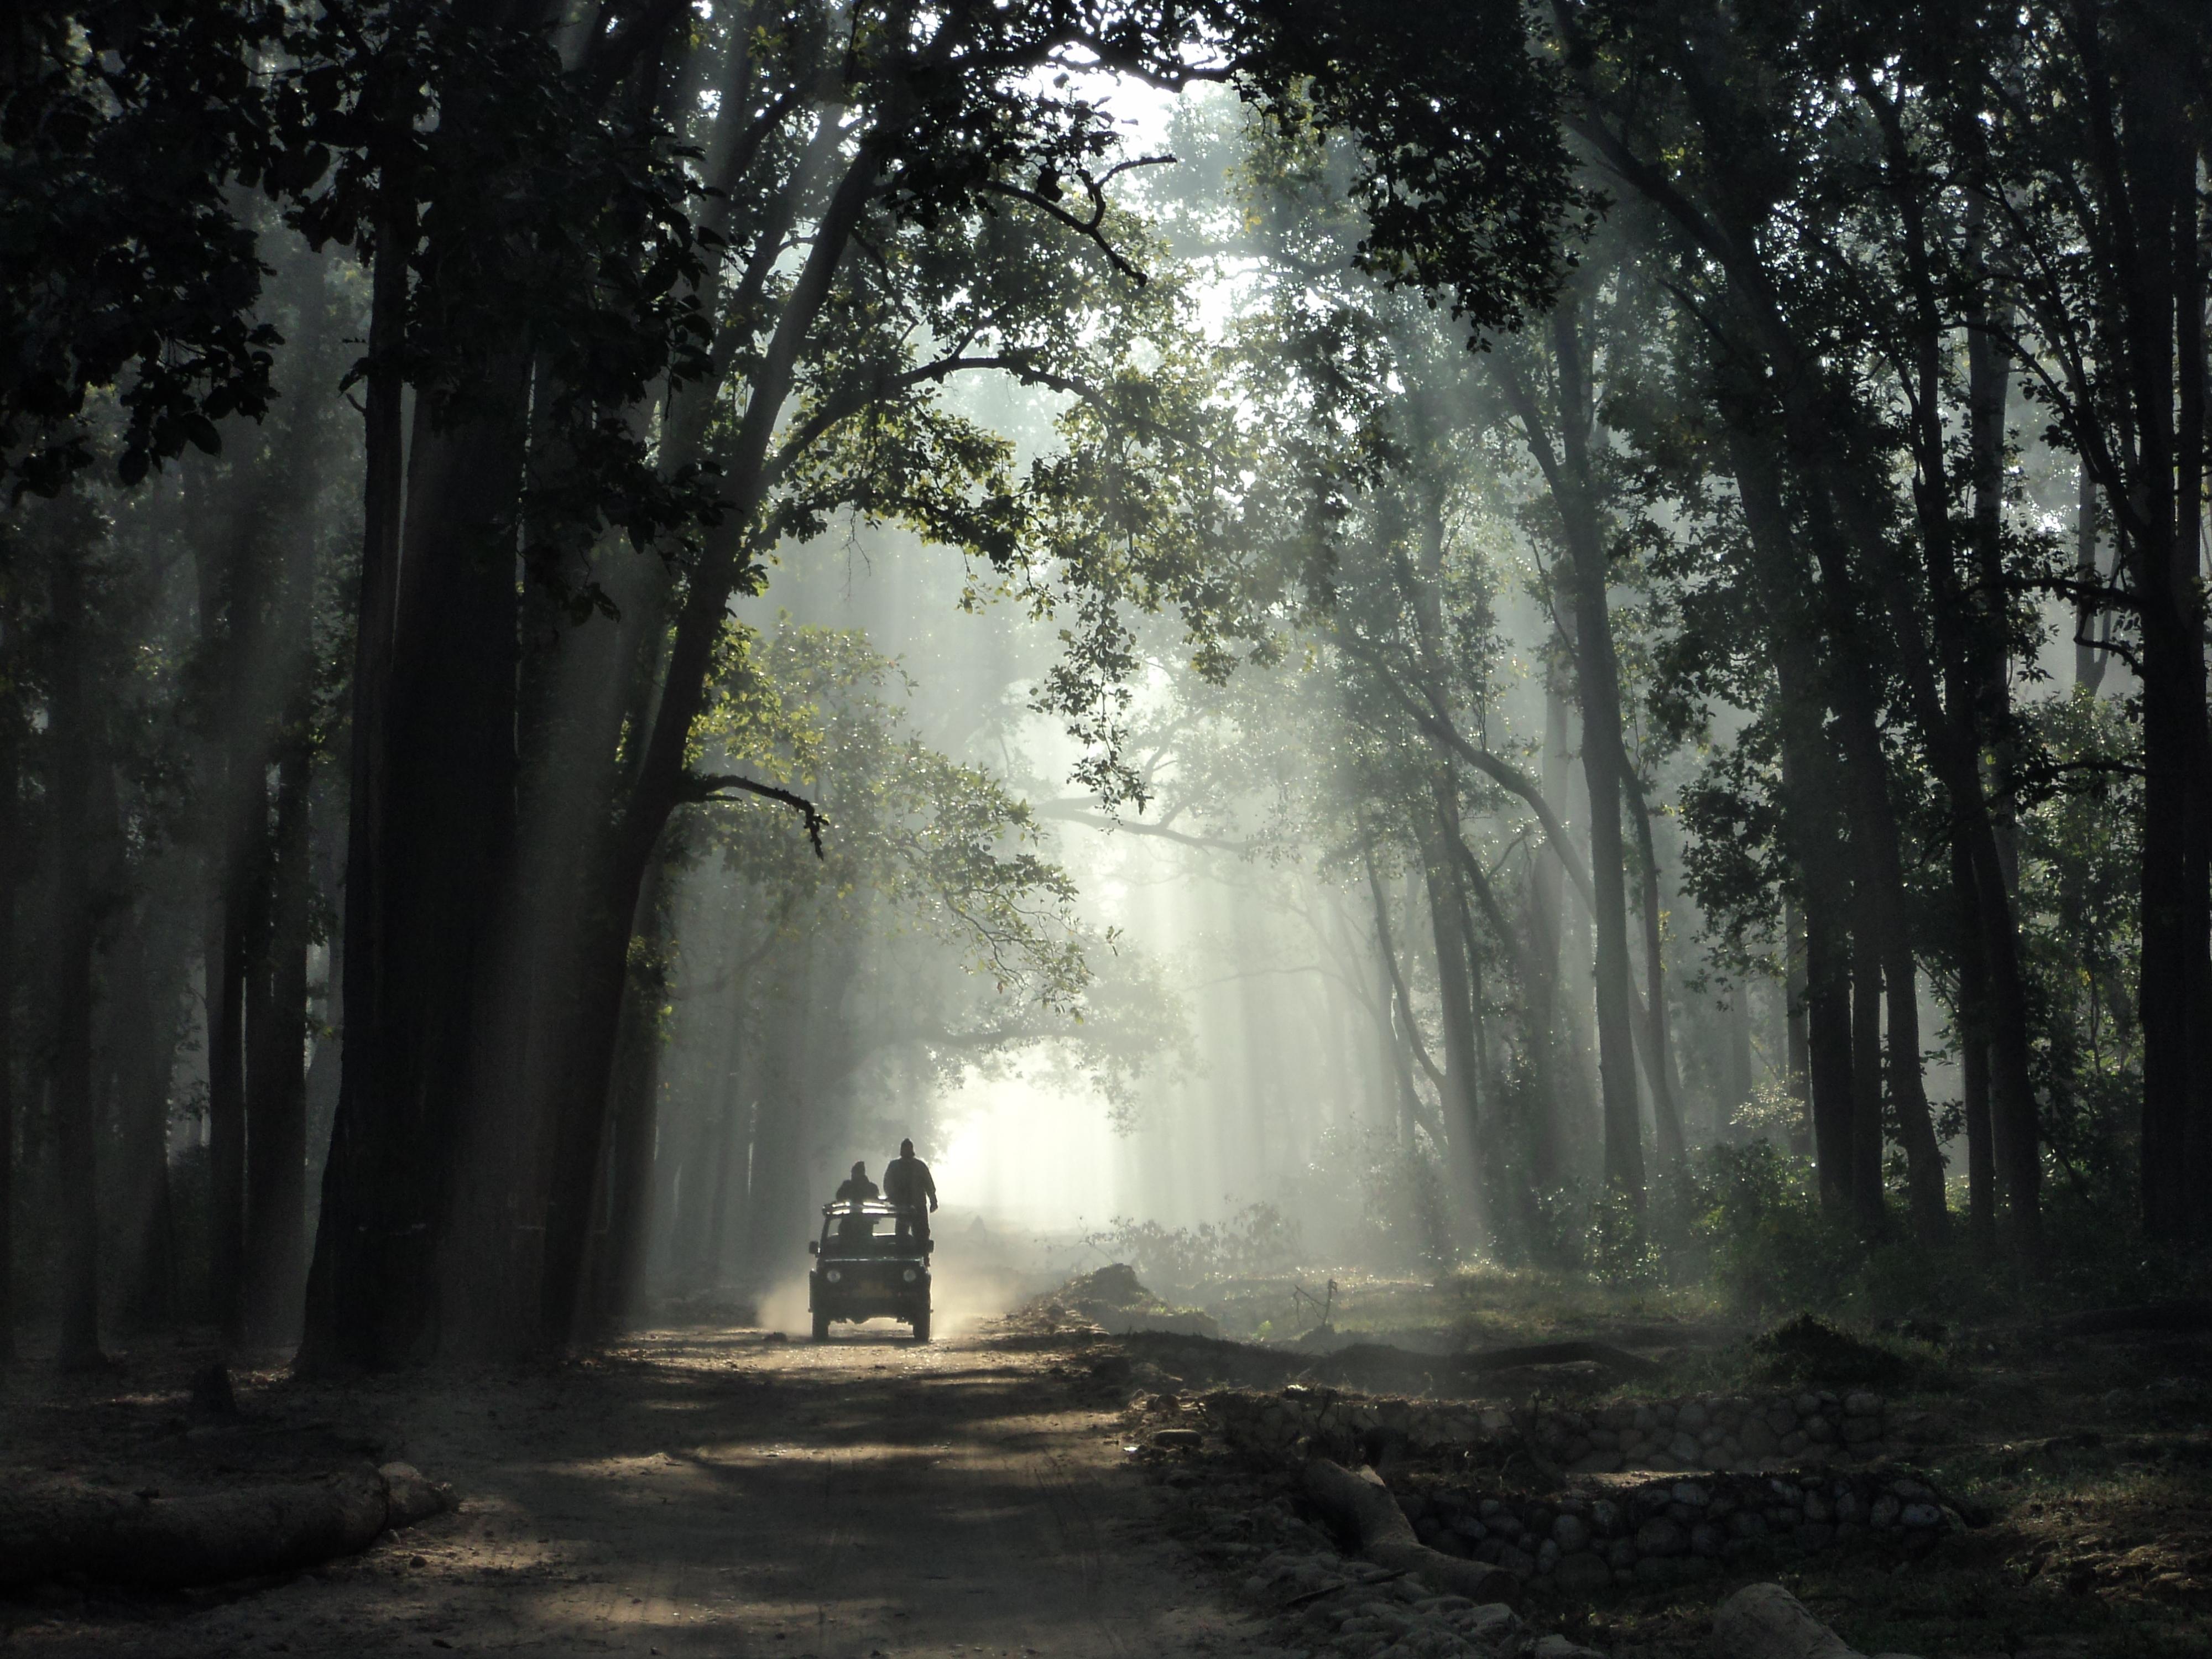 Jim_Corbett_National_Park_(India)